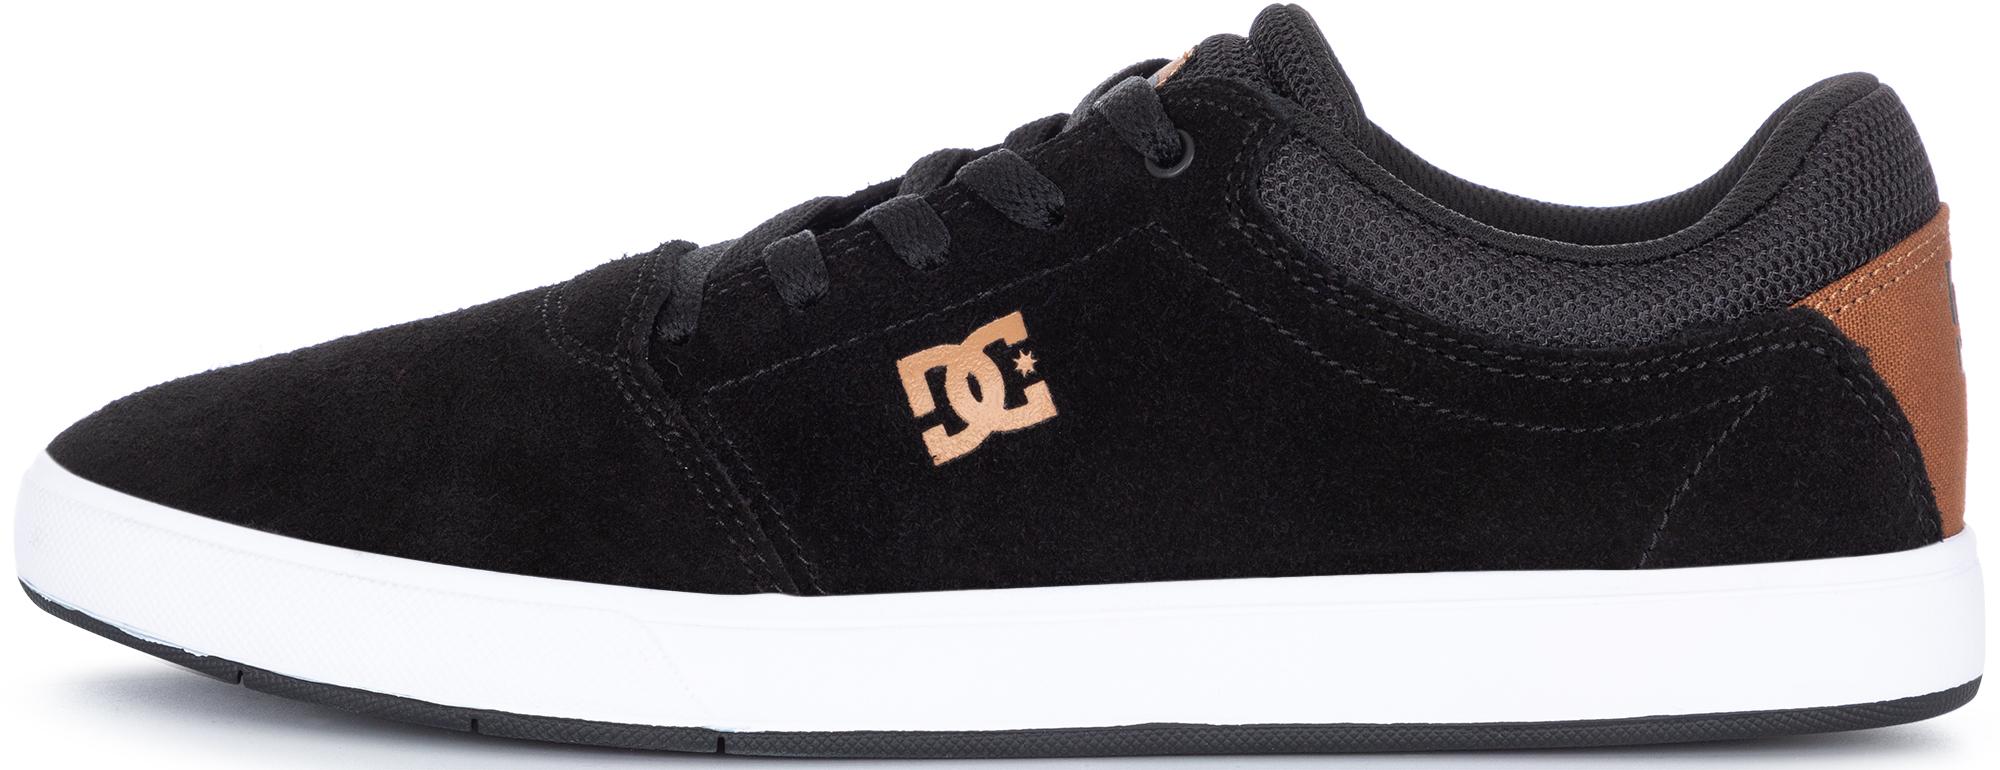 DC Shoes Кеды мужские SHOES Crisis, размер 44